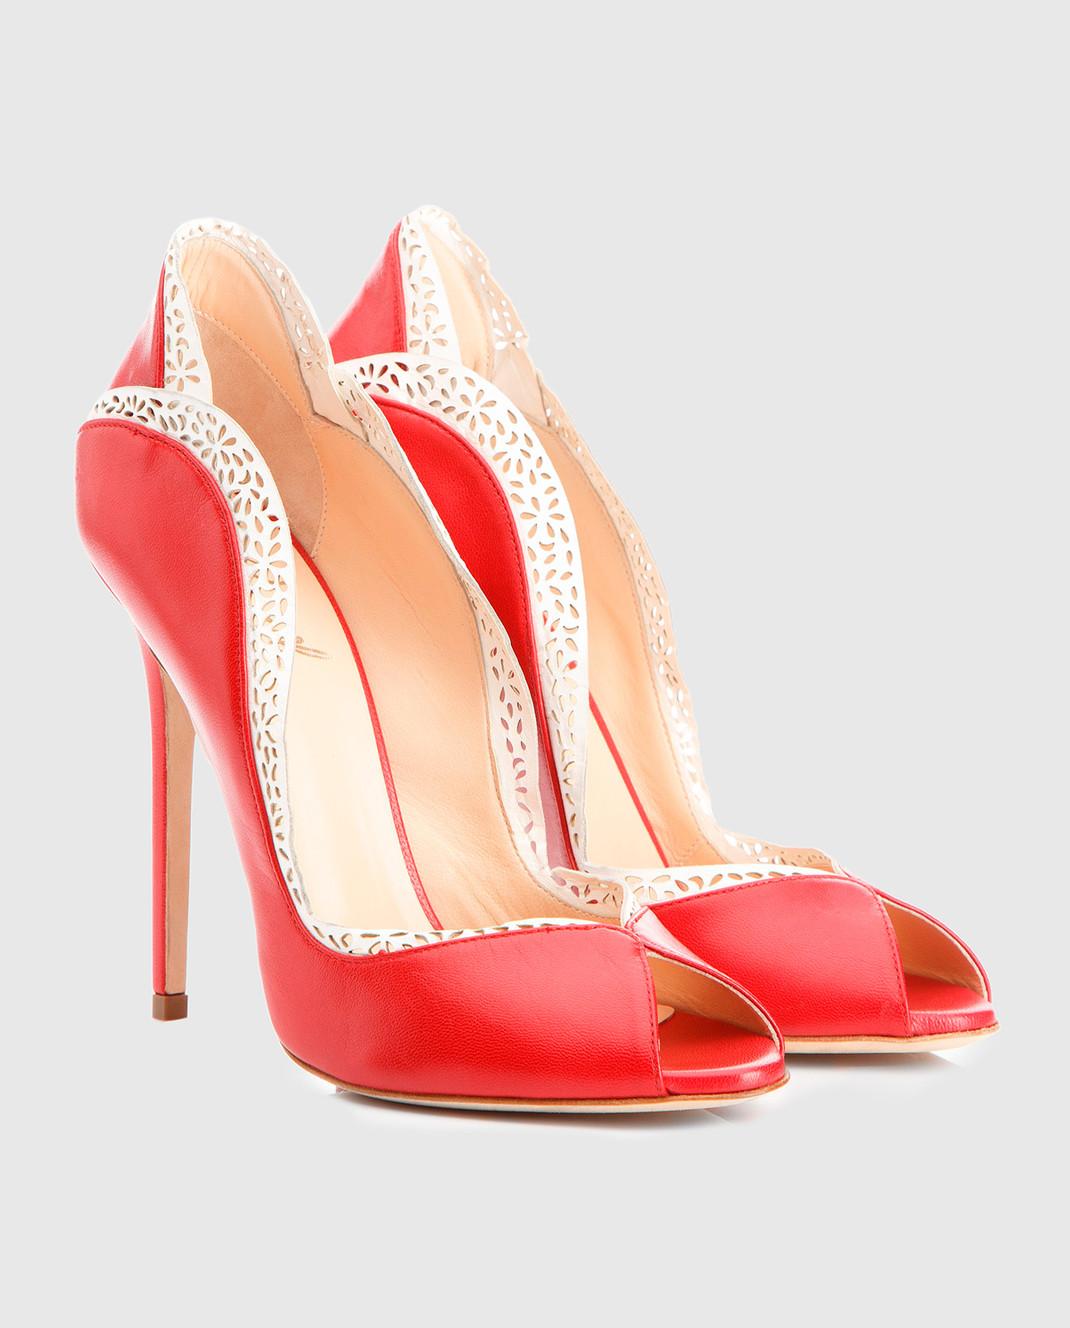 Cerasella Красные кожаные туфли DANAECAPRETTO DANAECAPRETTO изображение 3